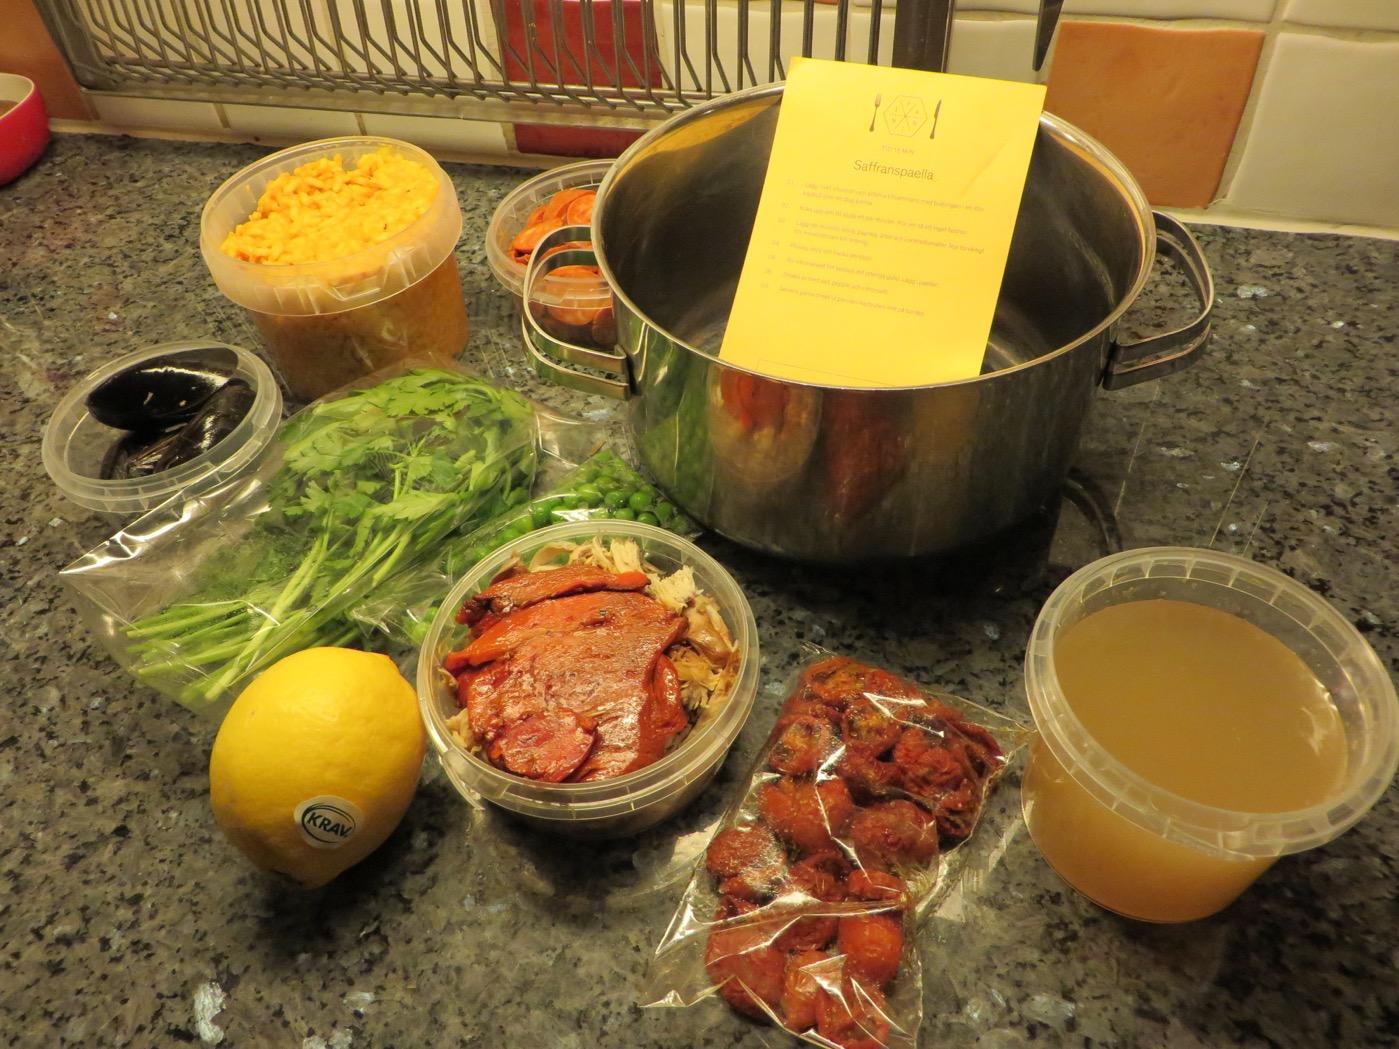 Middagslåda från Panini - Saffranspaella